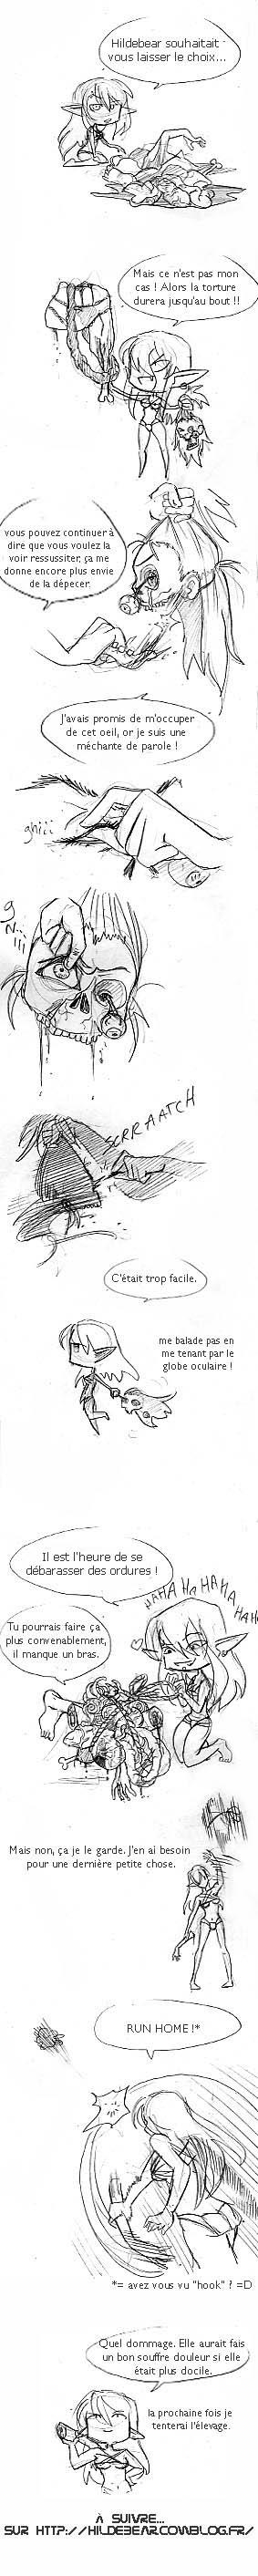 http://hildebear.cowblog.fr/images/export/cheztanooki4.jpg